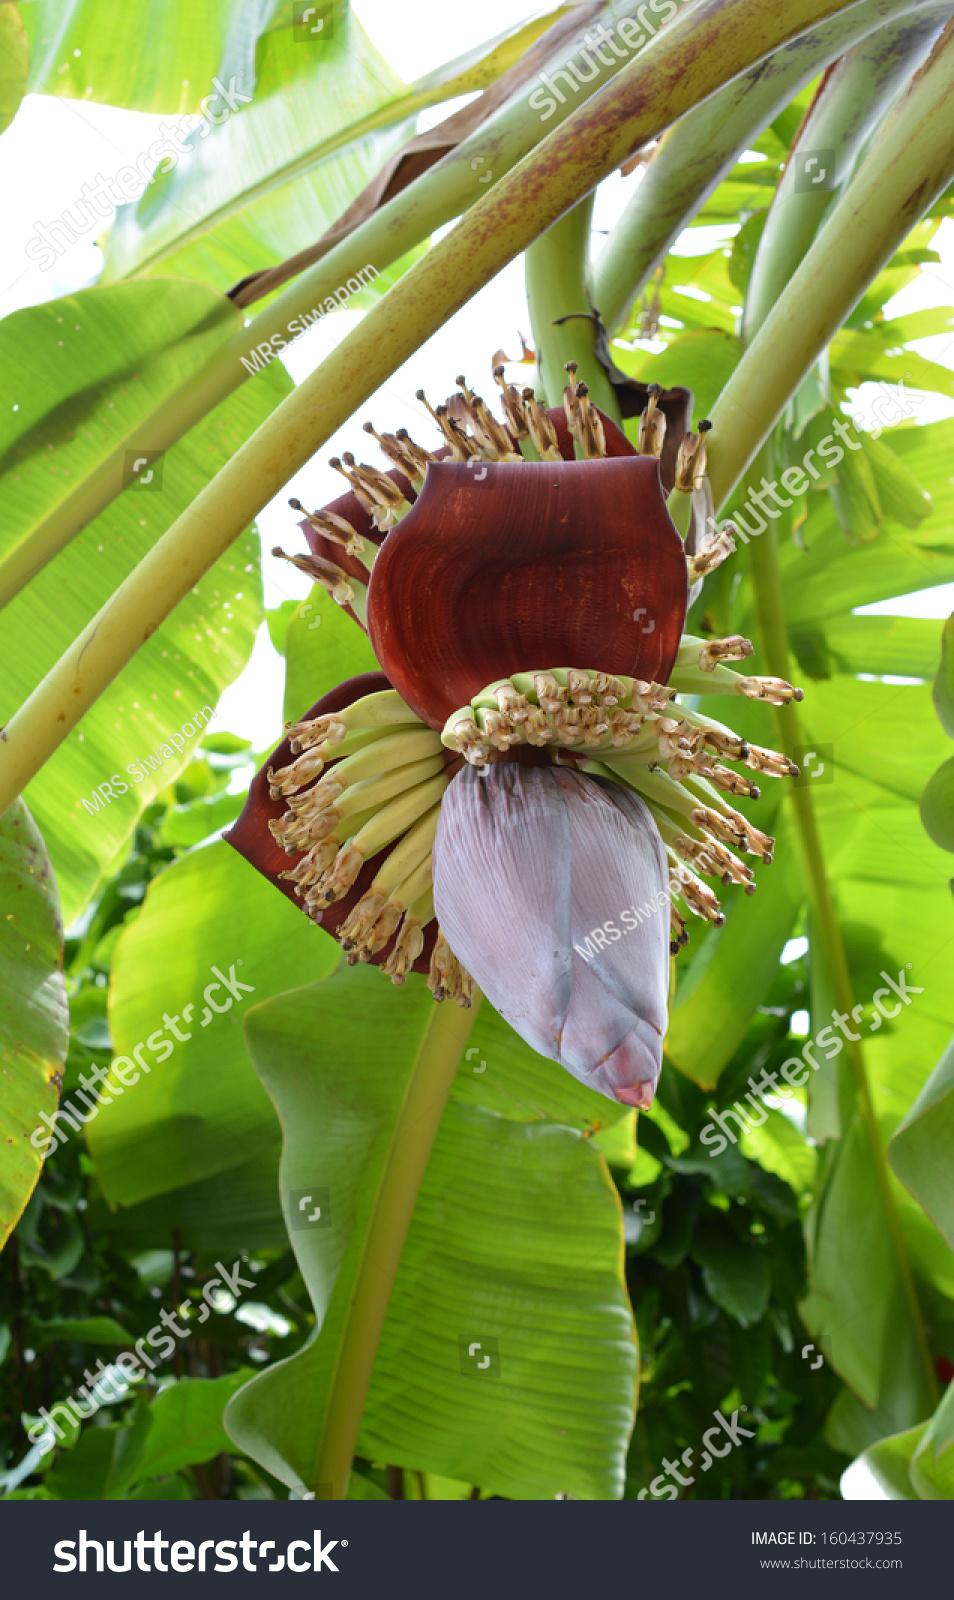 Red Banana Blossom See The Small Green Bananas Stock Photo 160437935 : Shutterstock